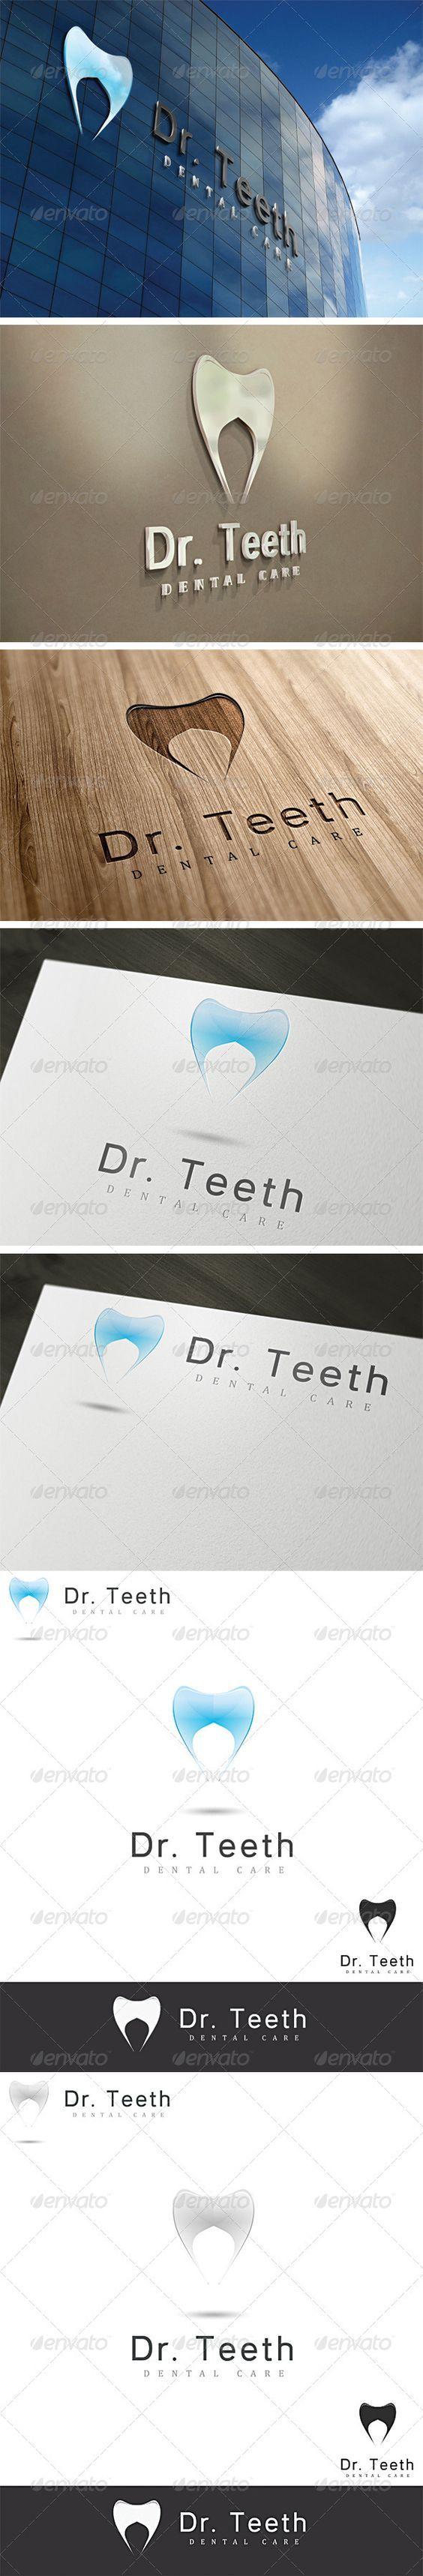 Dr. Teeth Dental Logo Template